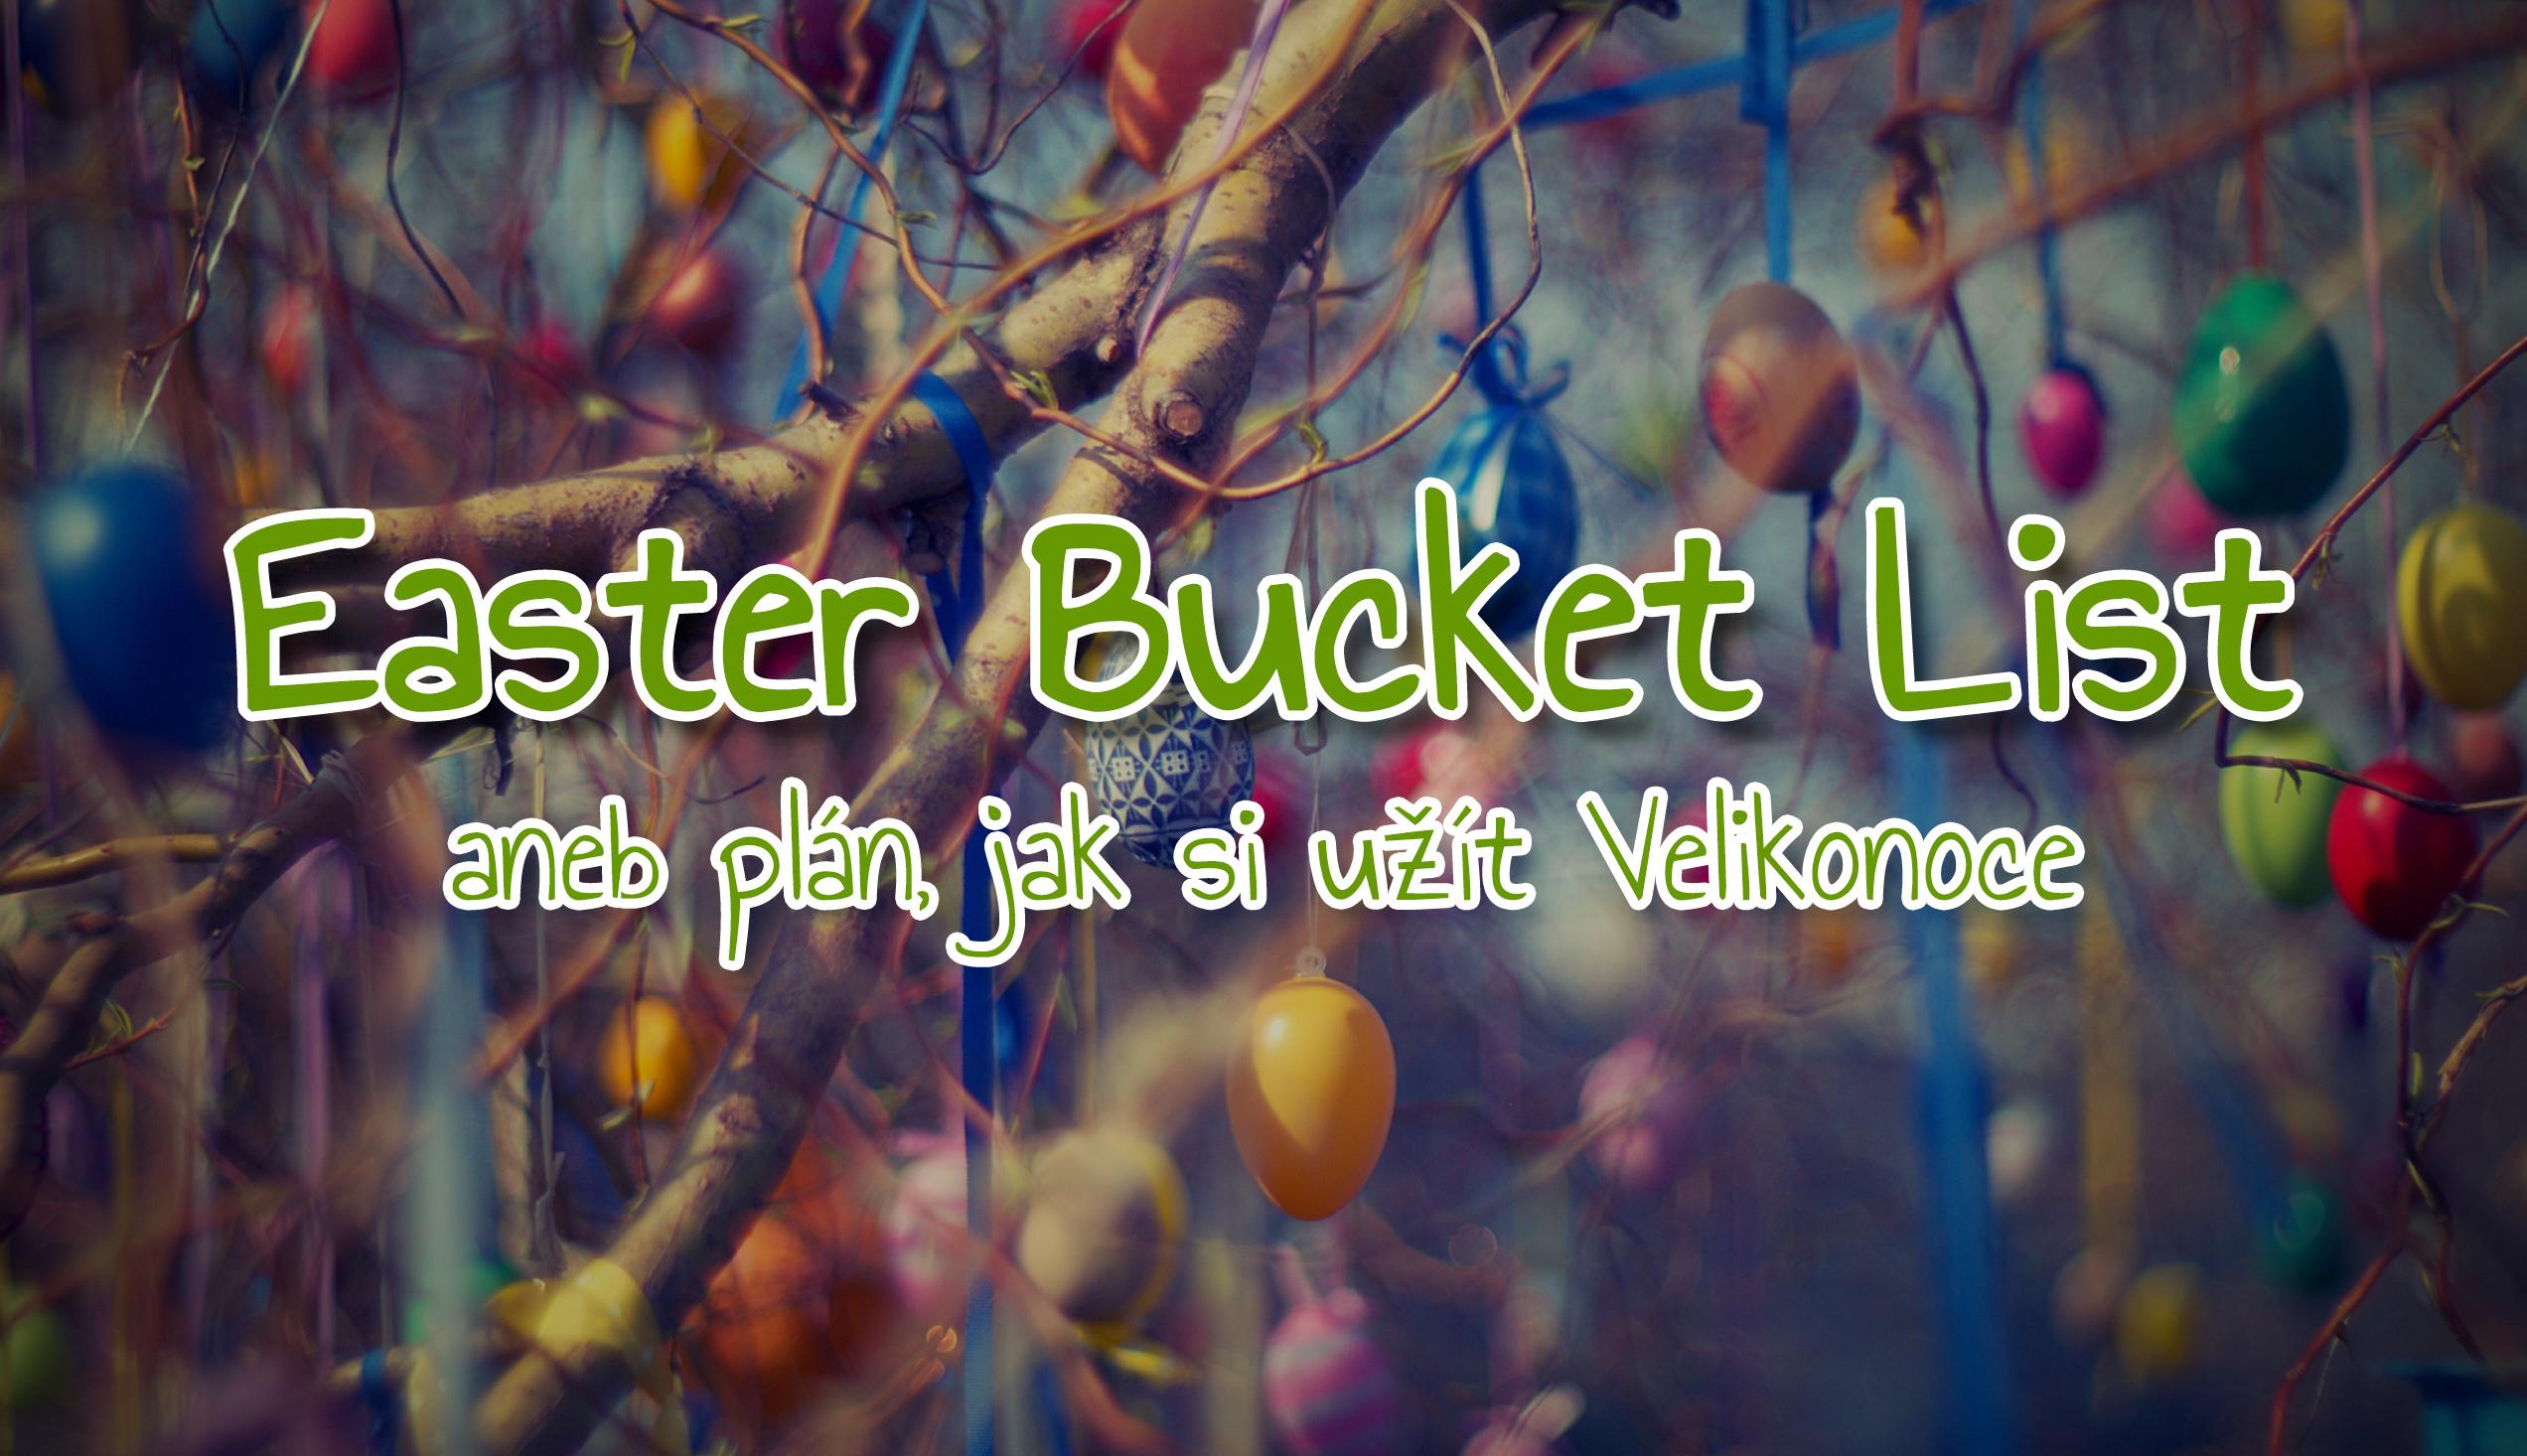 Easter Bucket List aneb plán, jak si užít Velikonoce